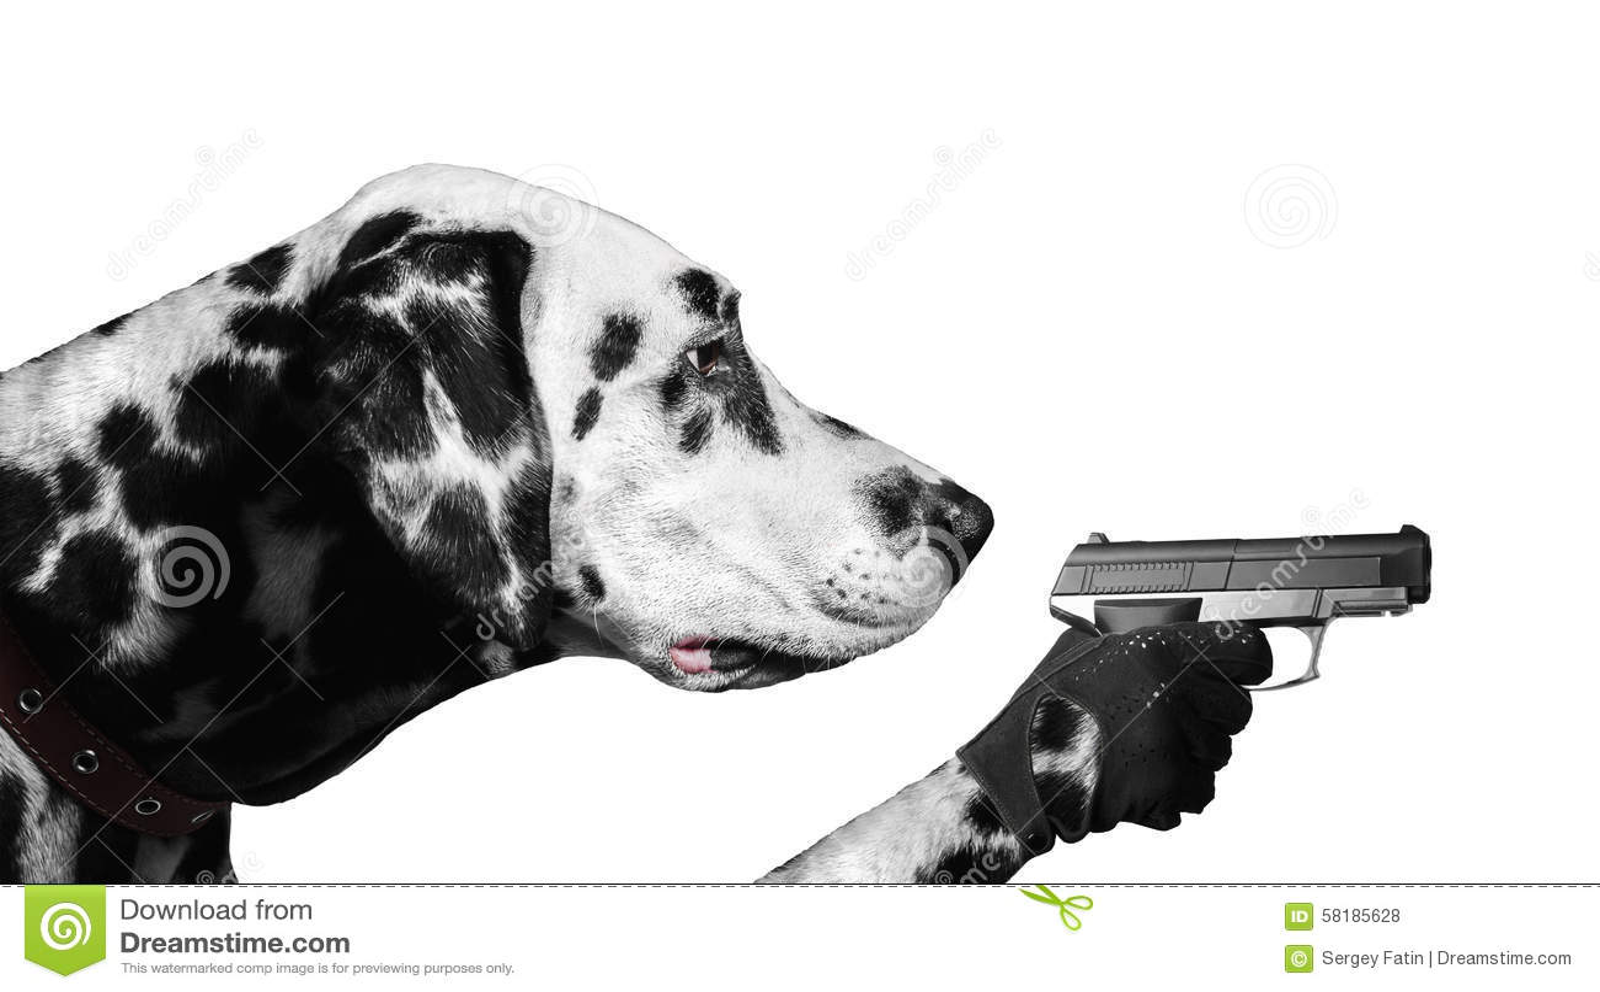 Dalmatian Dog With Guns Stock Photo - Image: 58185628